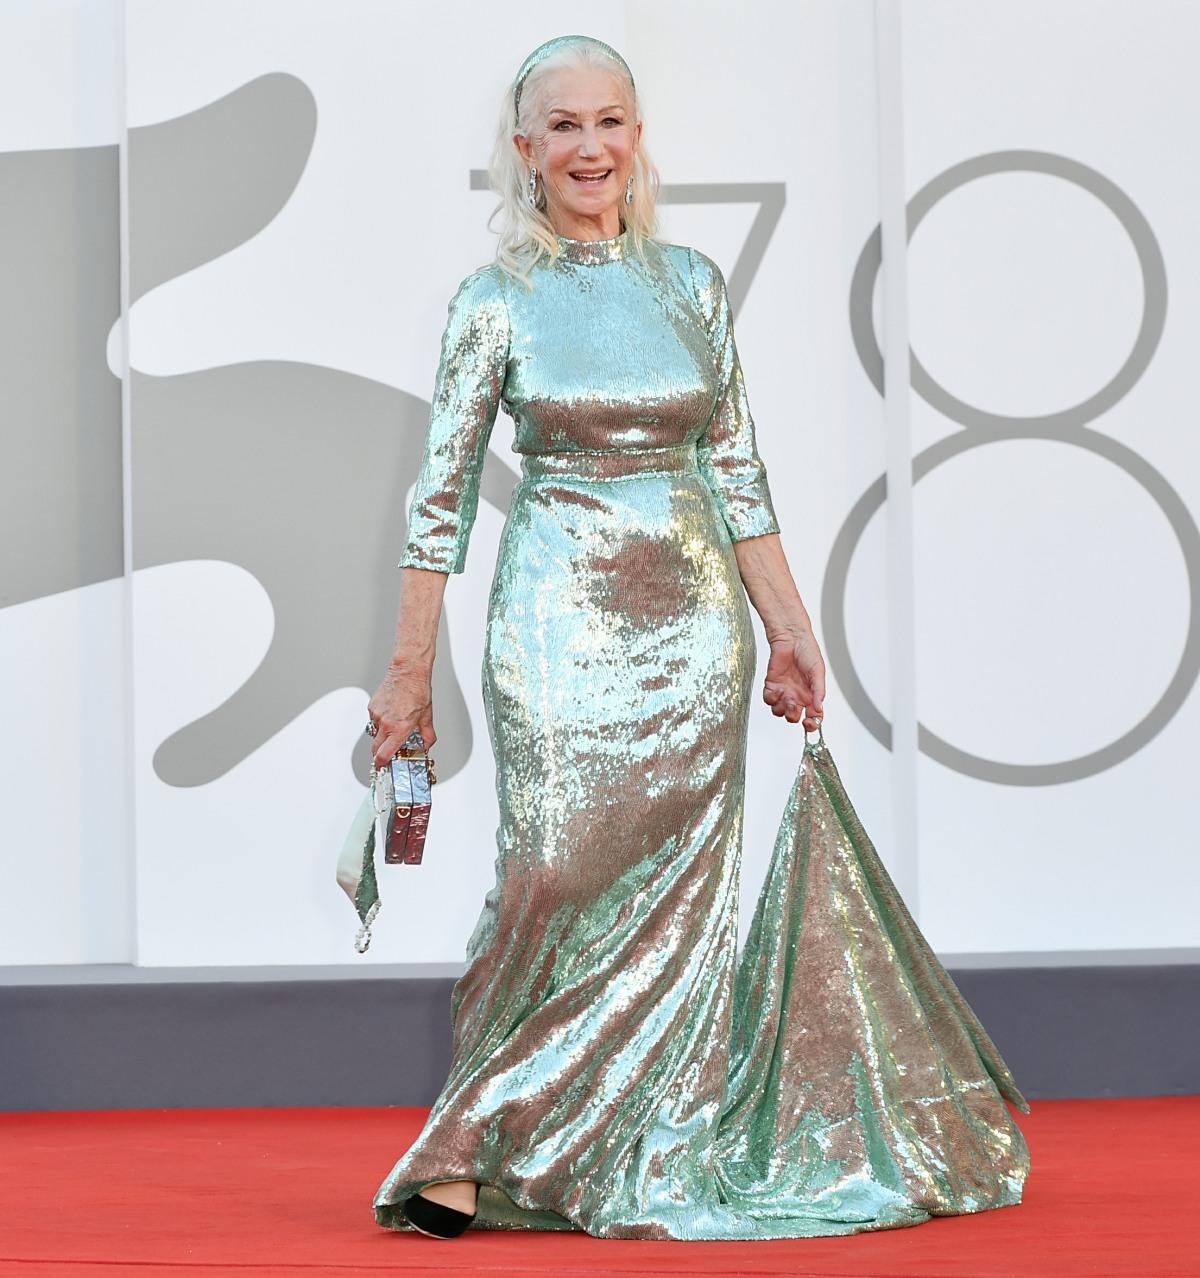 Opening Ceremony, 78th Venice International Film Festival, Italy - 01 Sep 2021